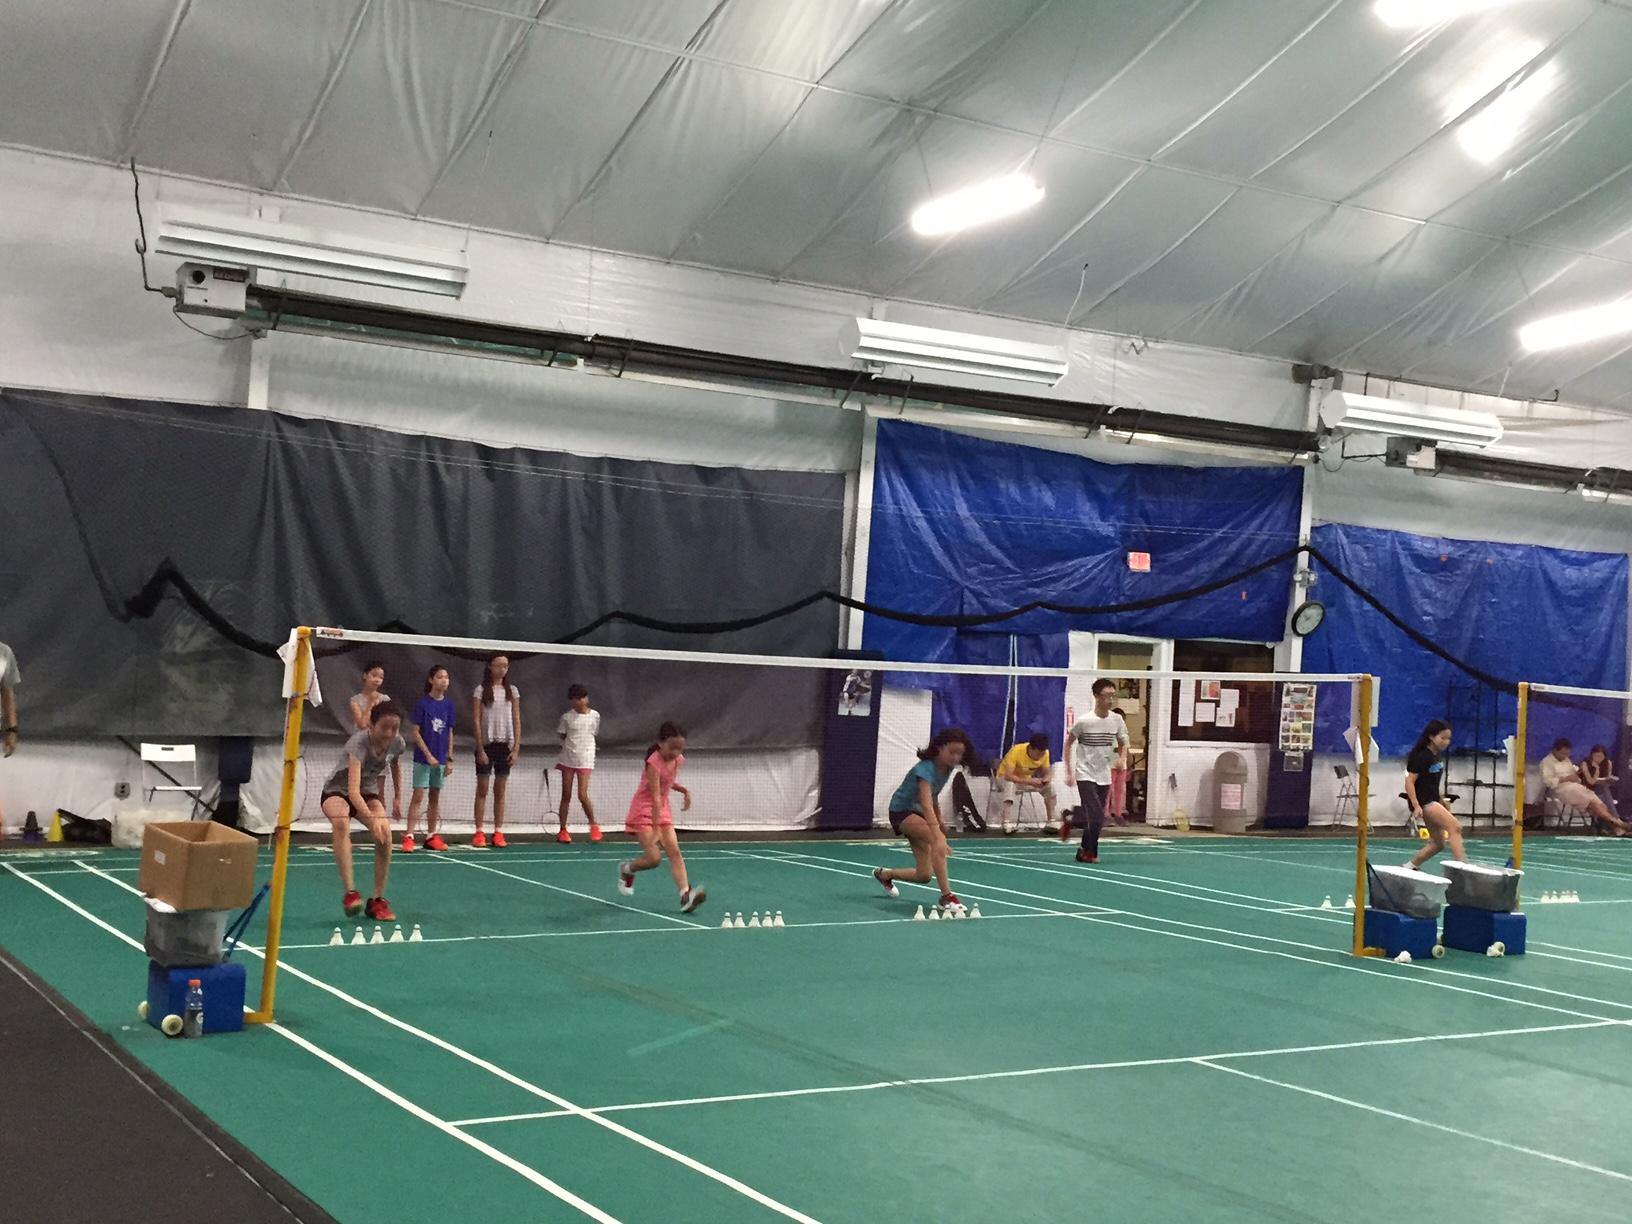 LISC Badminton Group Training